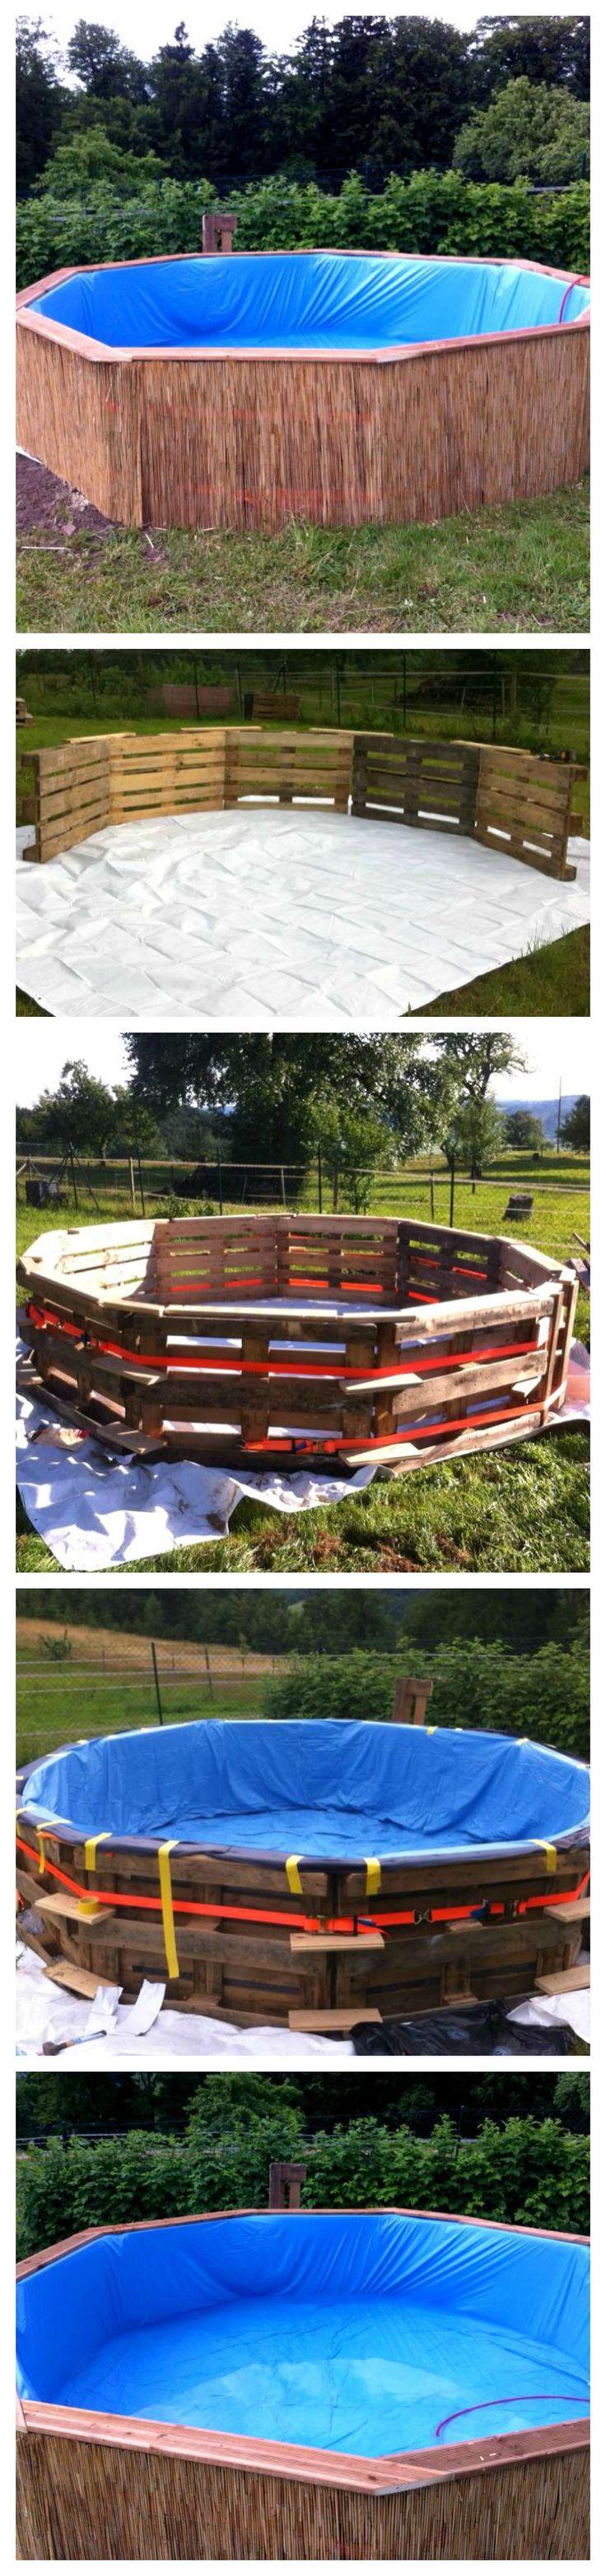 best home backyard inspiration images on pinterest decks